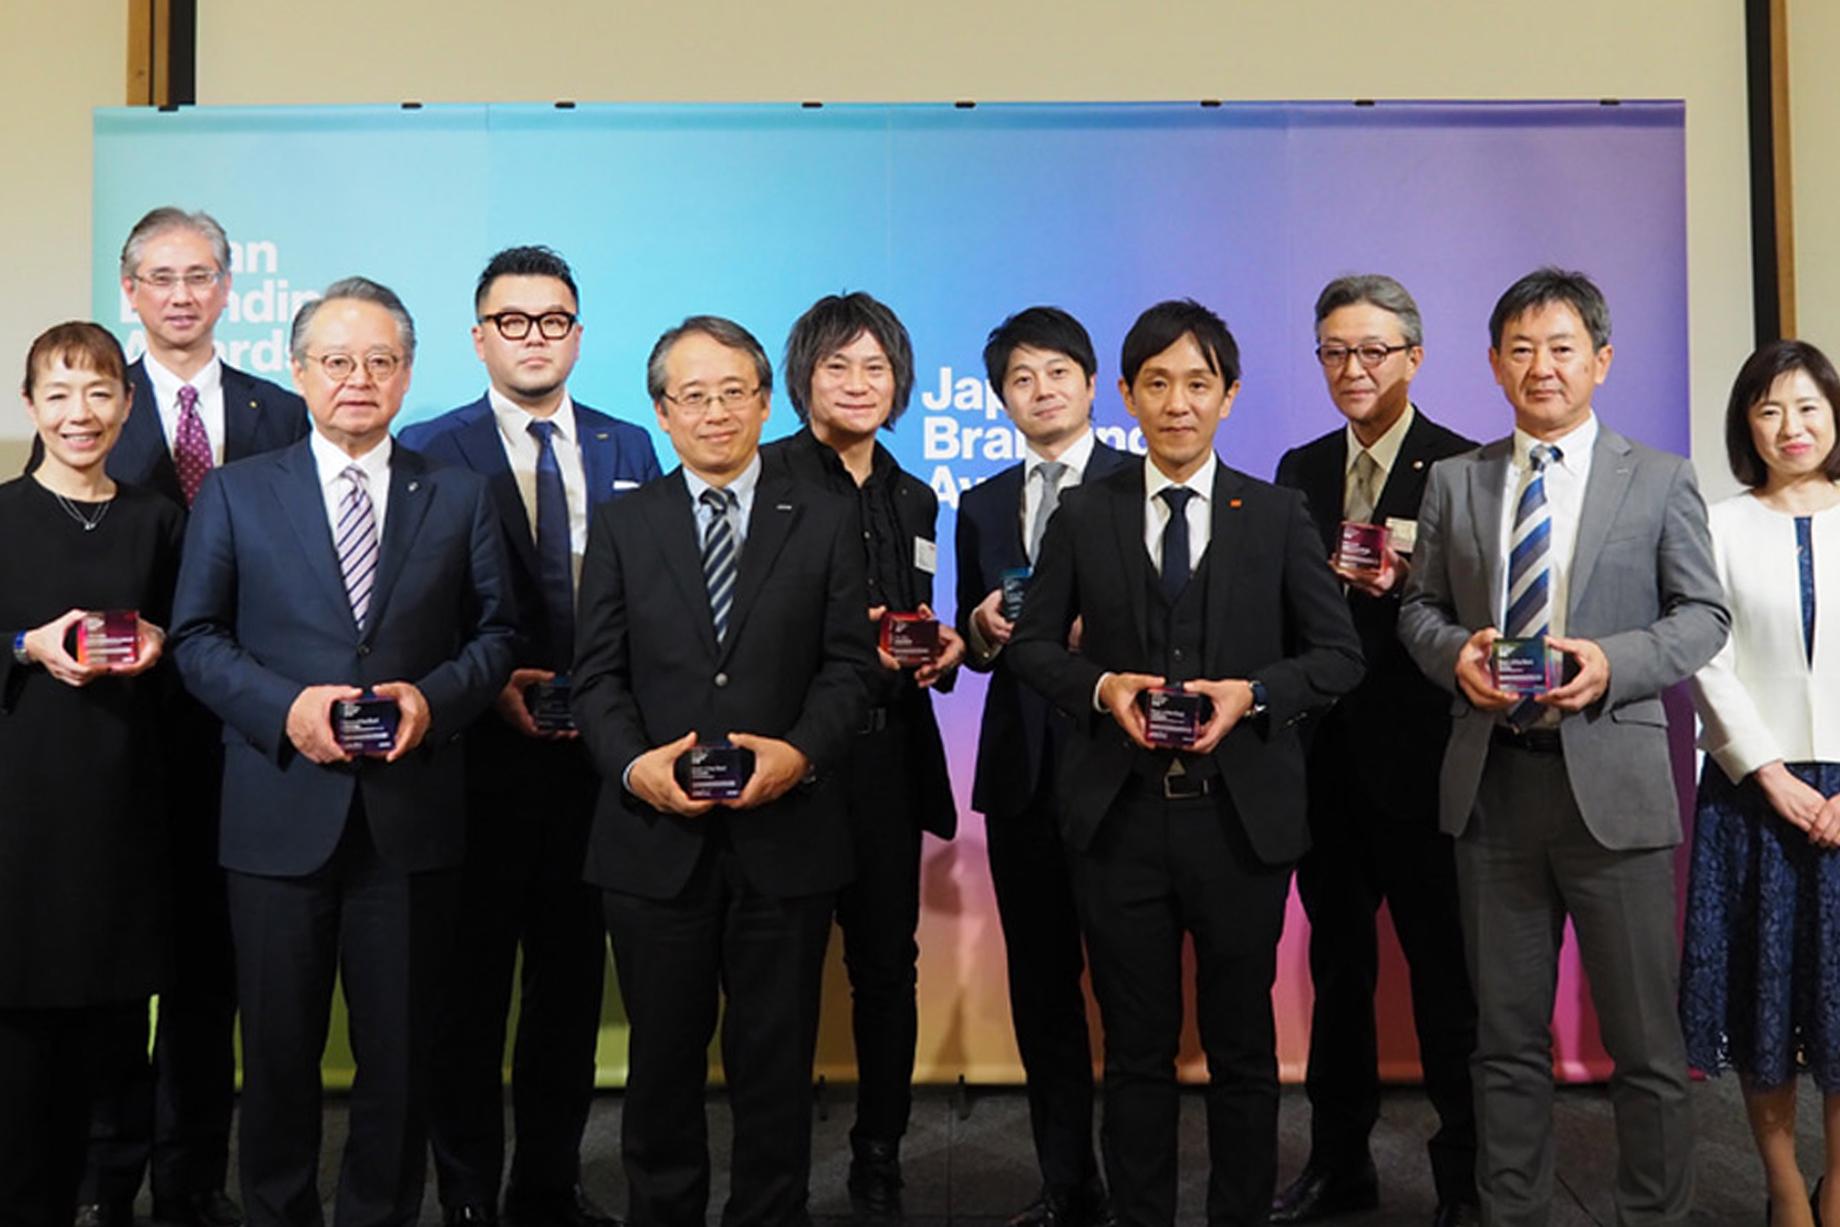 Japan Branding Award 2018